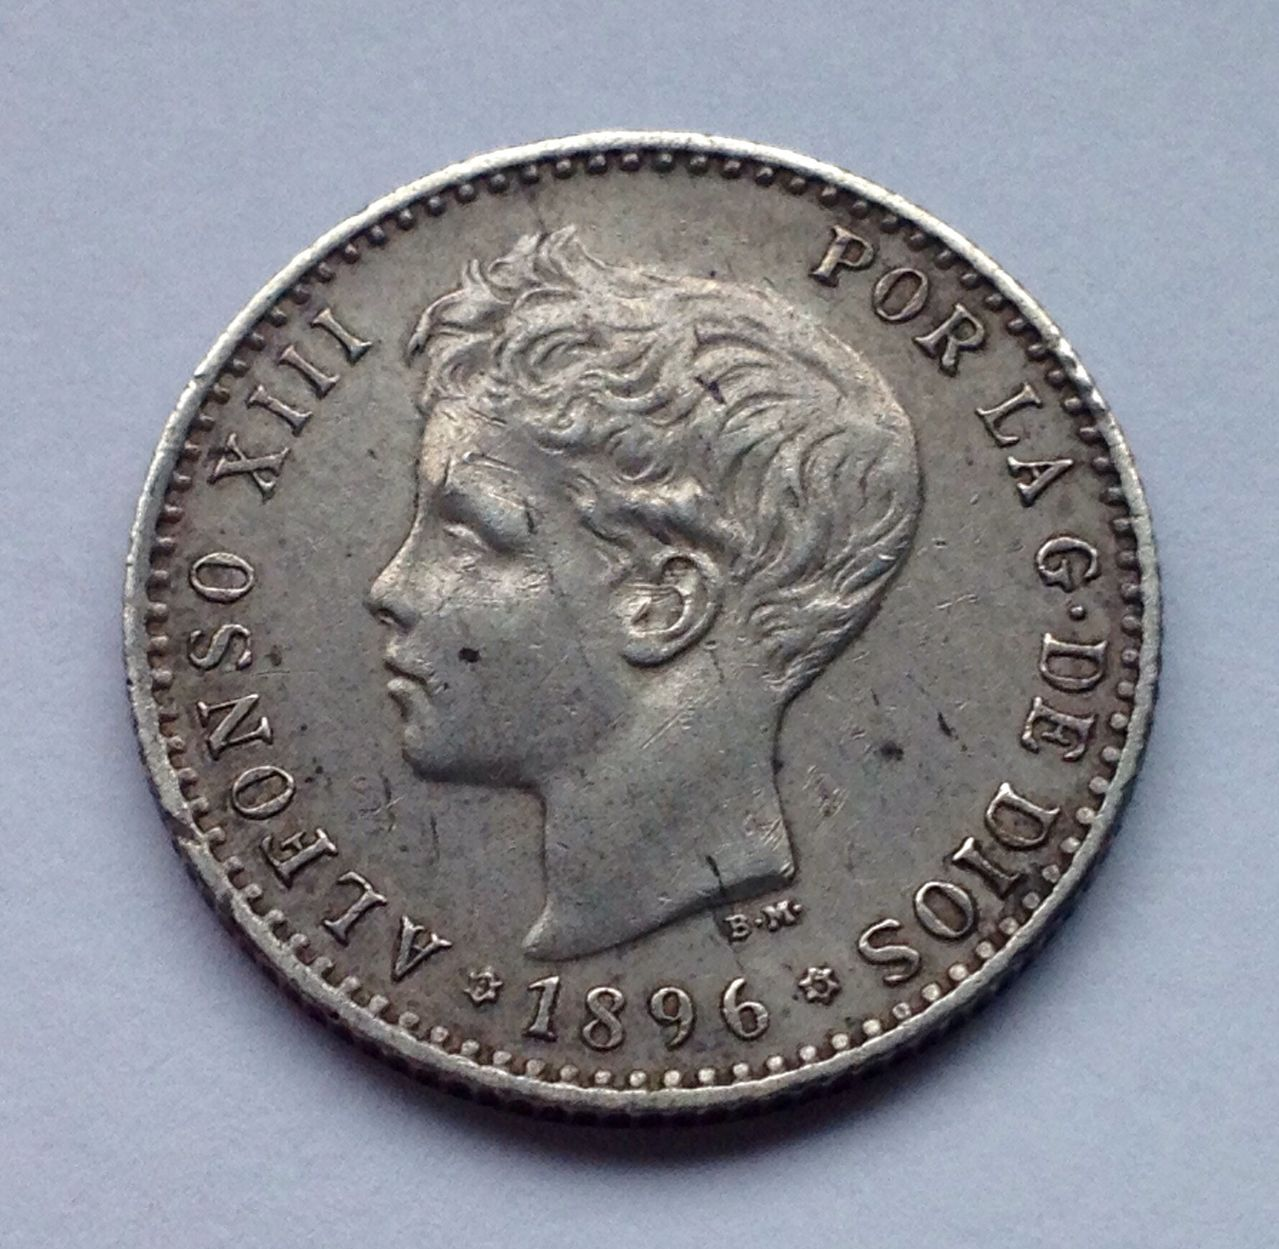 50 céntimos 1896 Alfonso XIII - Cartima dedit Image